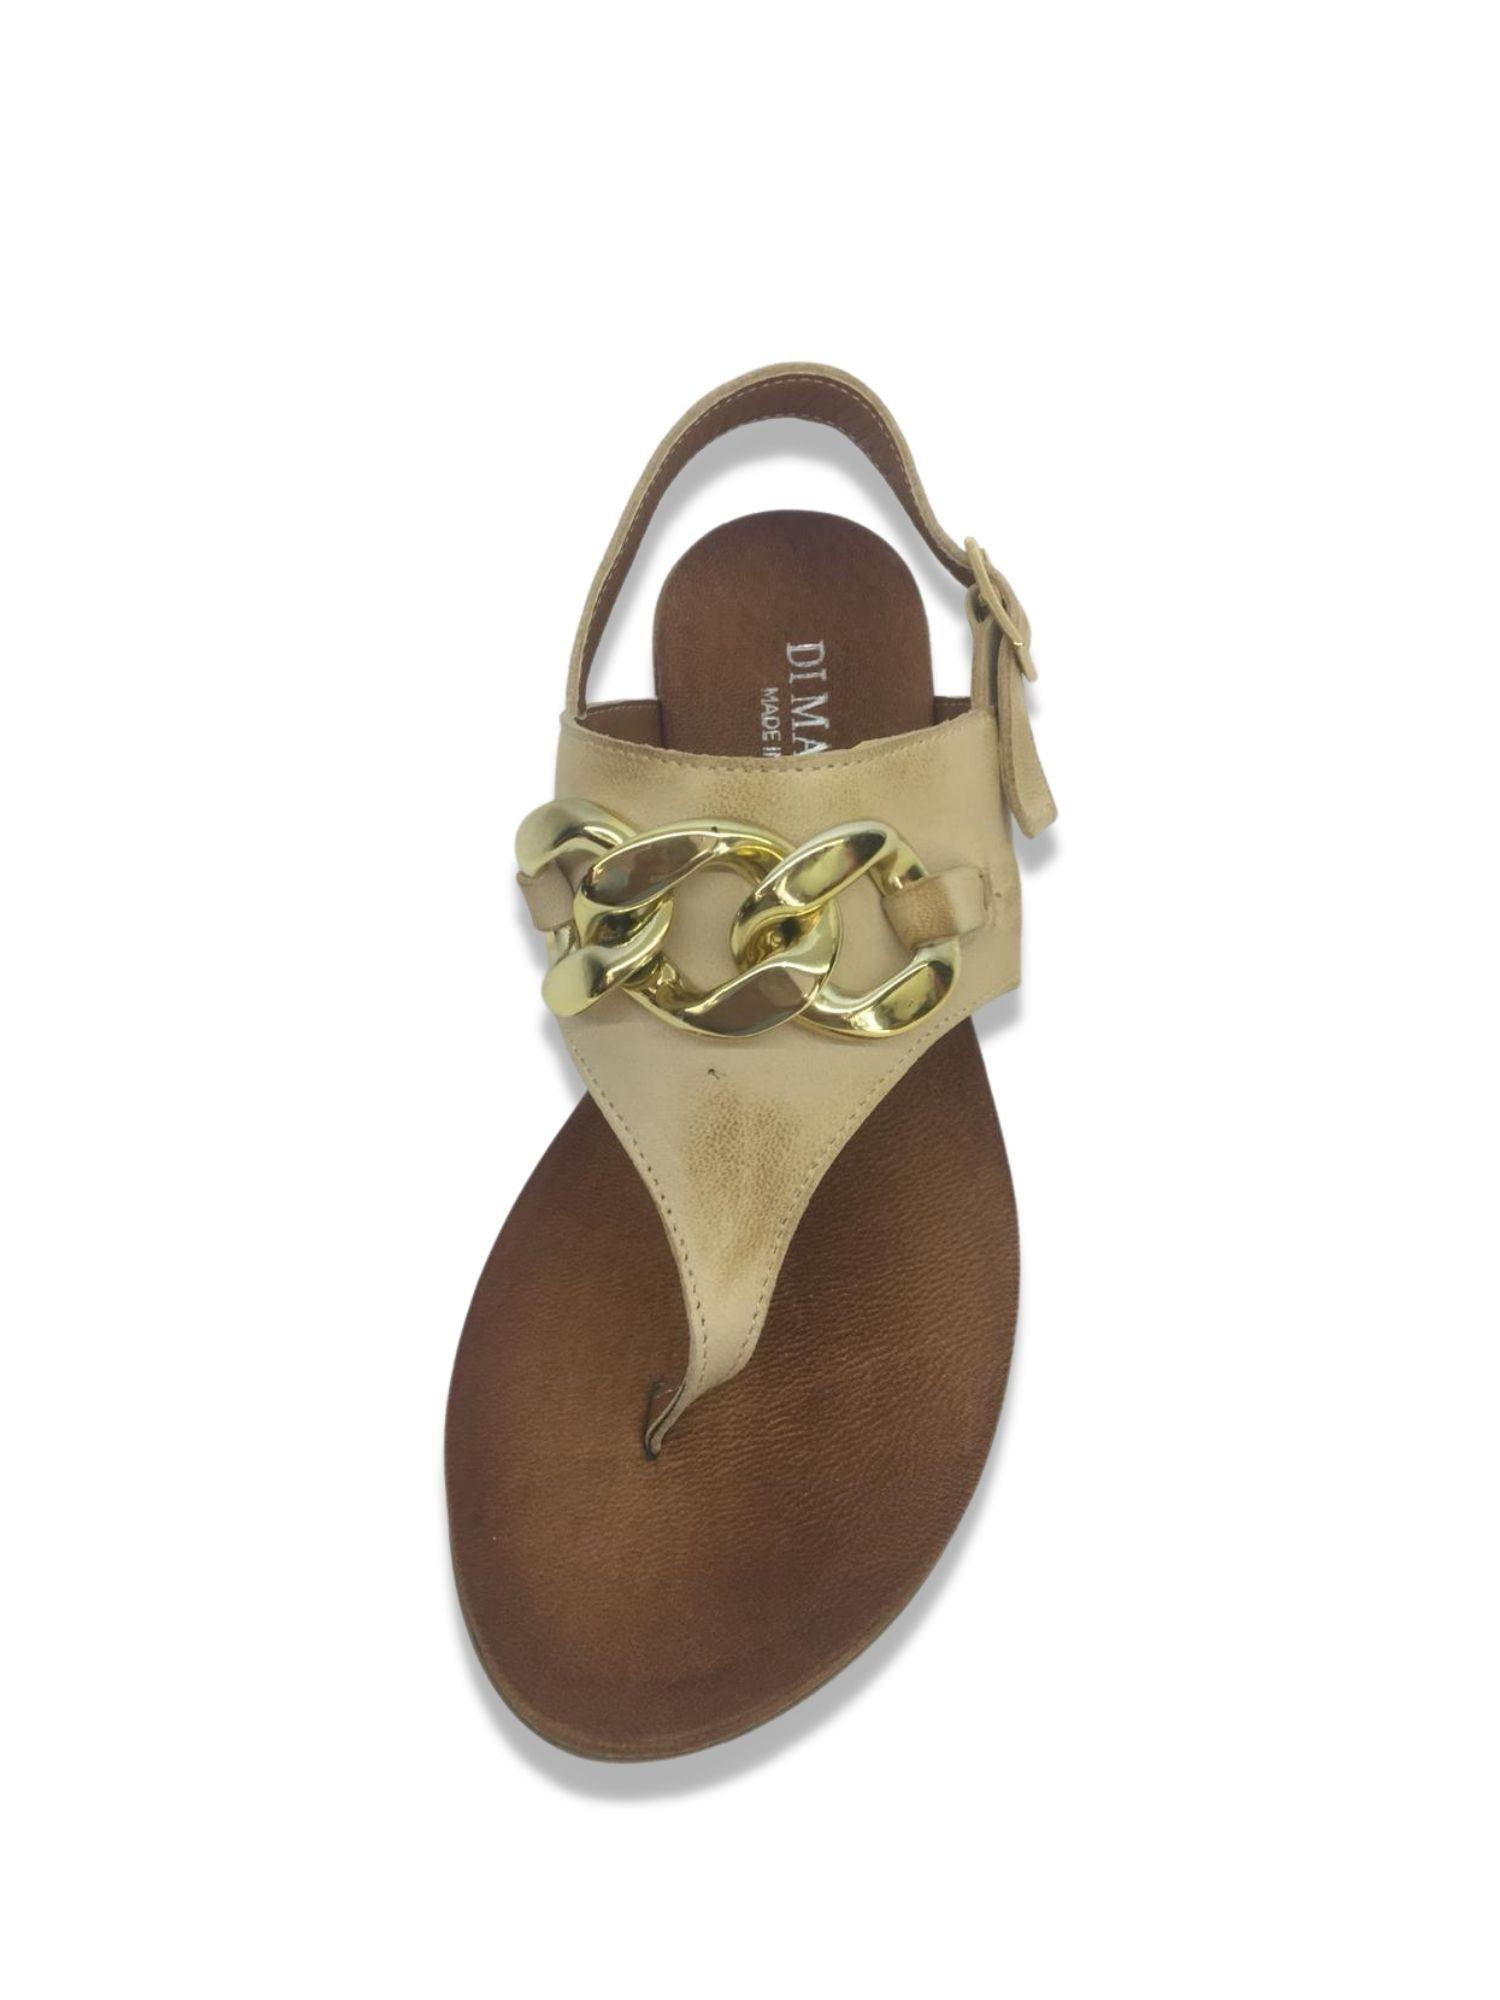 Sandalo infradito Made in Italy 203 Beige alto